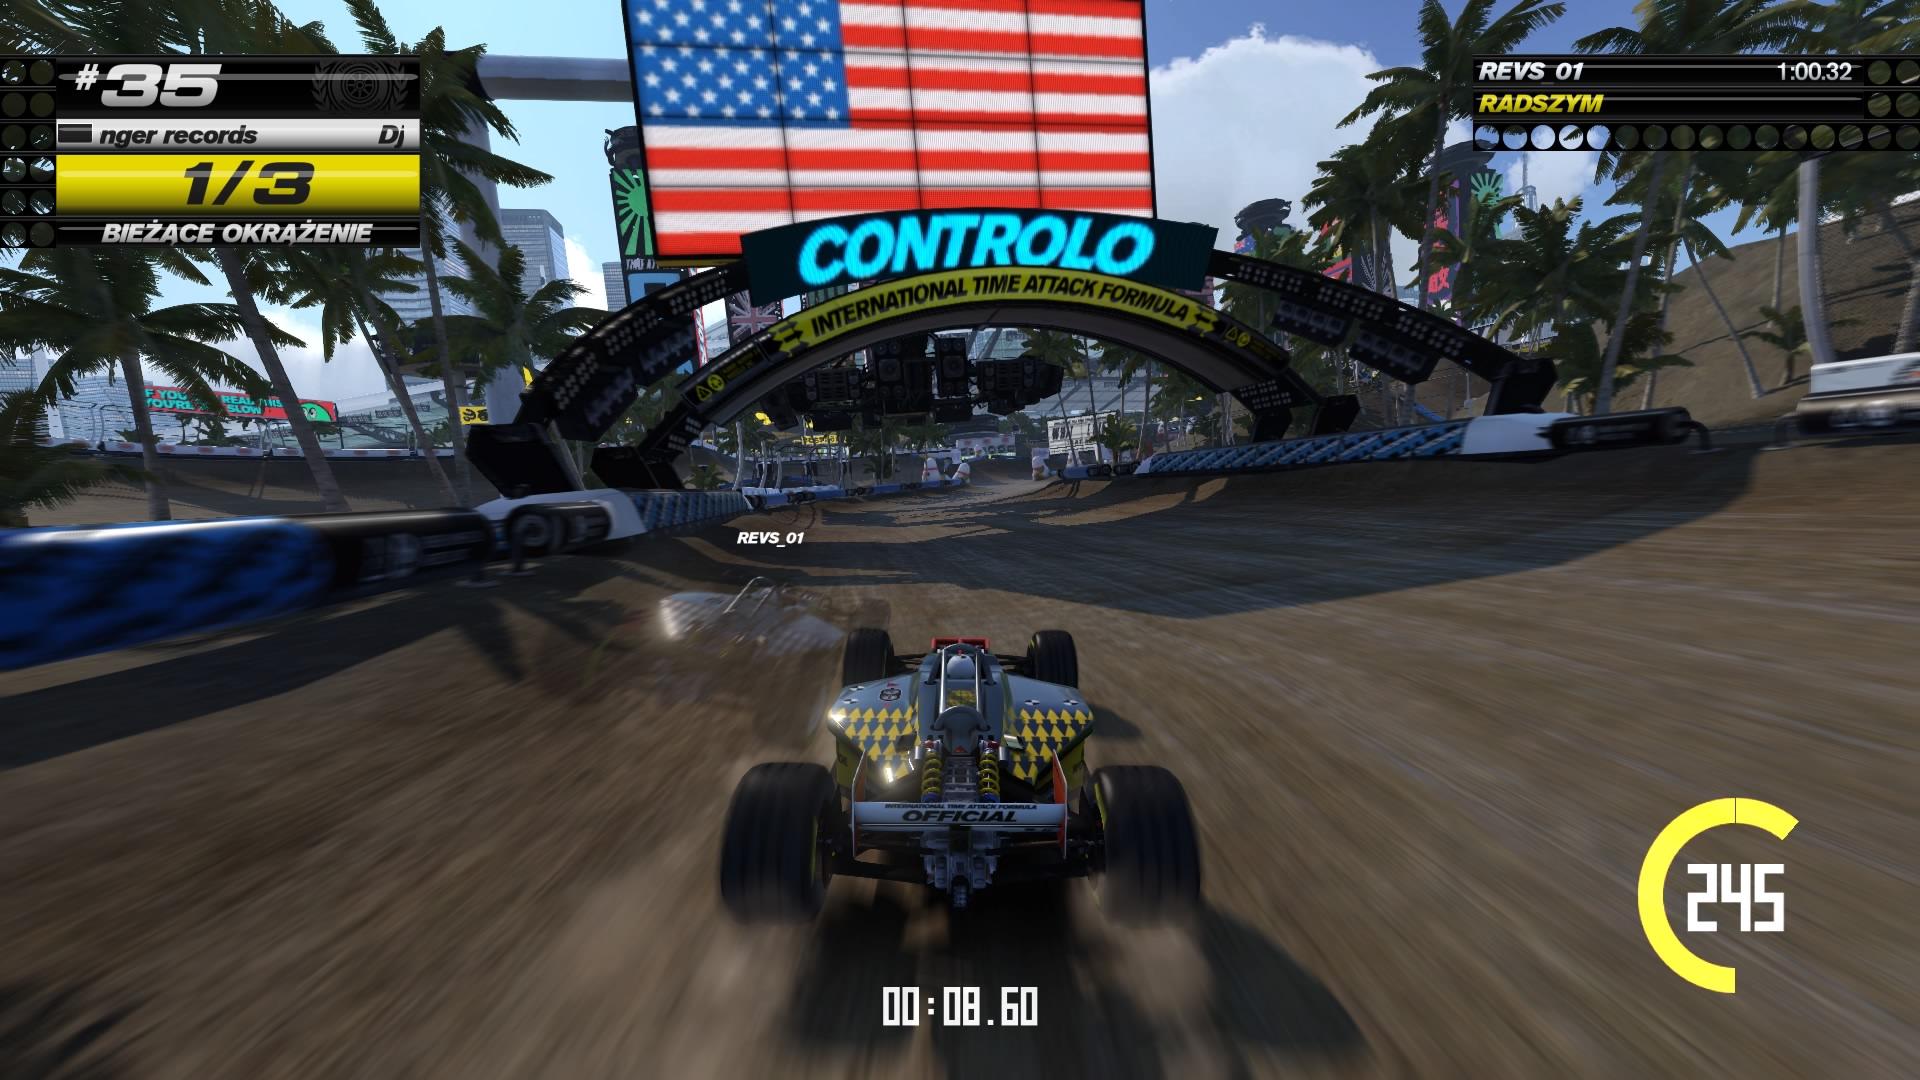 Trackmania Turbo PS Plus